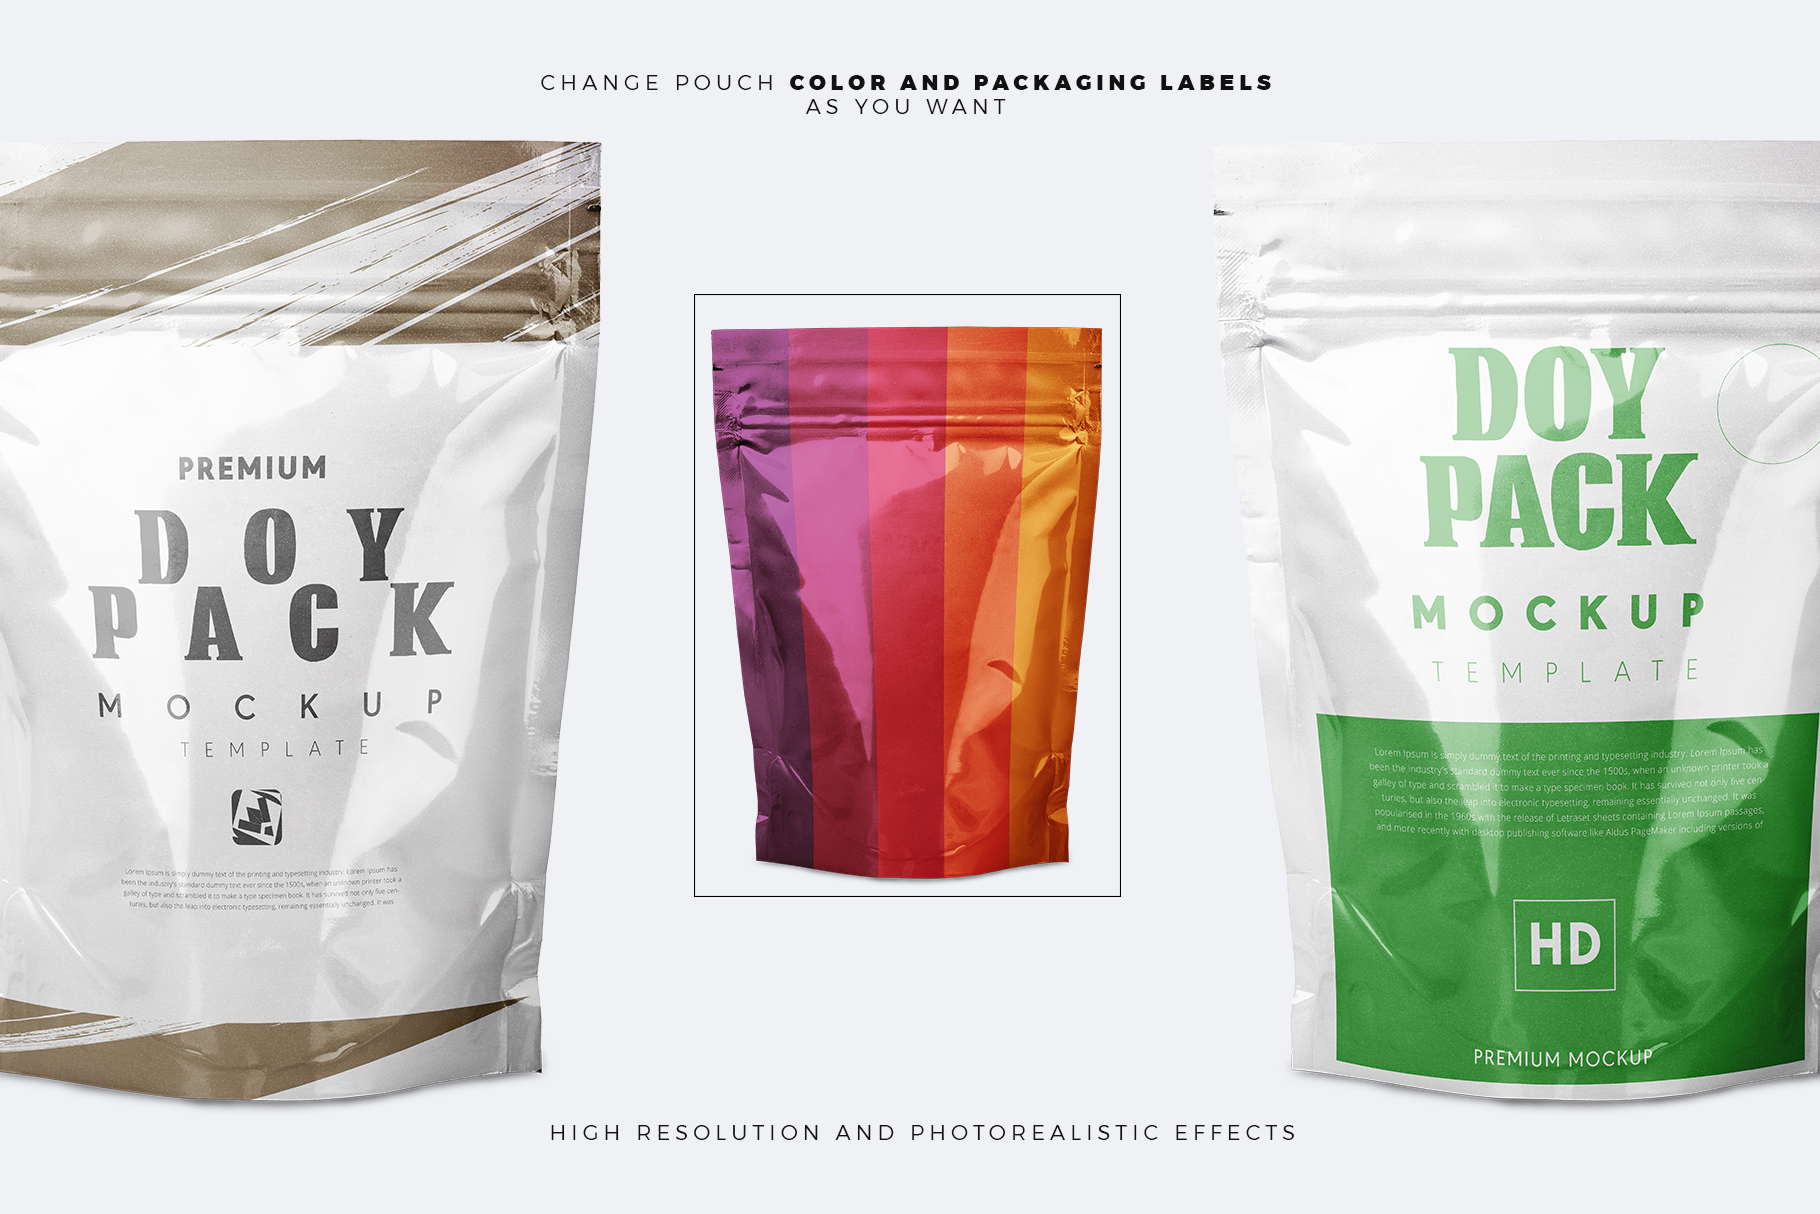 doypack pouch mockup templates color change option, label change options presented